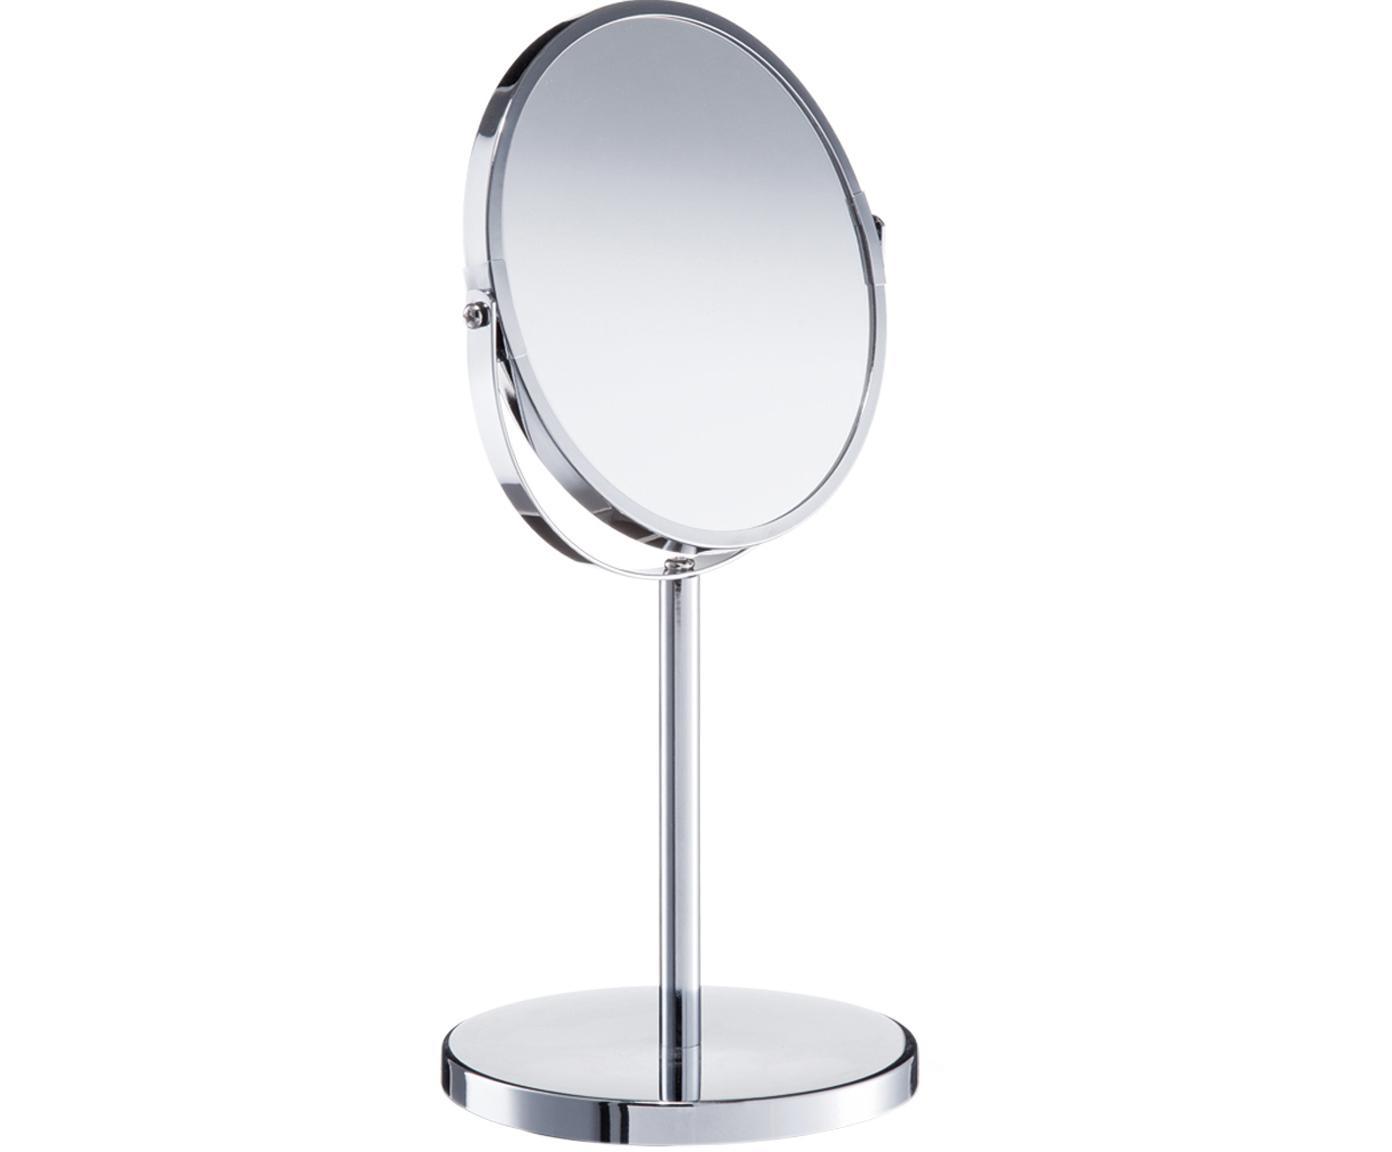 Espejo tocador Flip con aumento, Espejo: cristal, Plateado, Ø 17 x Al 35 cm